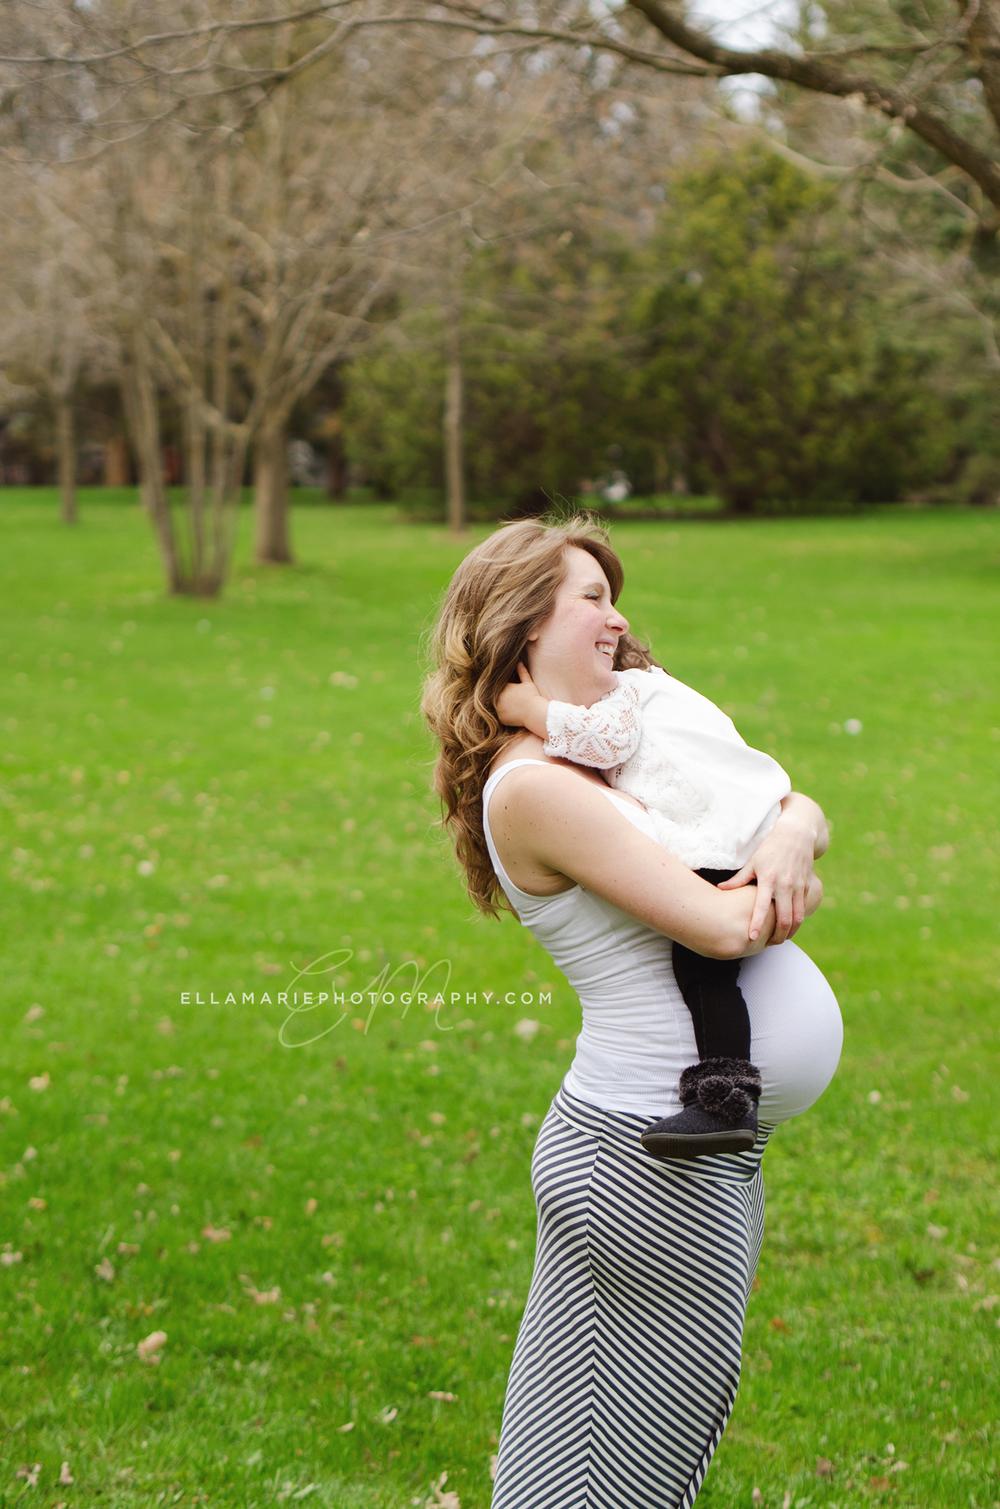 EllaMariePhotography_maternity_baby_infant_Baden_ON_New_Hamburg_Stratford_Waterloo_Kitchener_Guelph_Cambridge_Listowel_photographer_photography_35.jpg